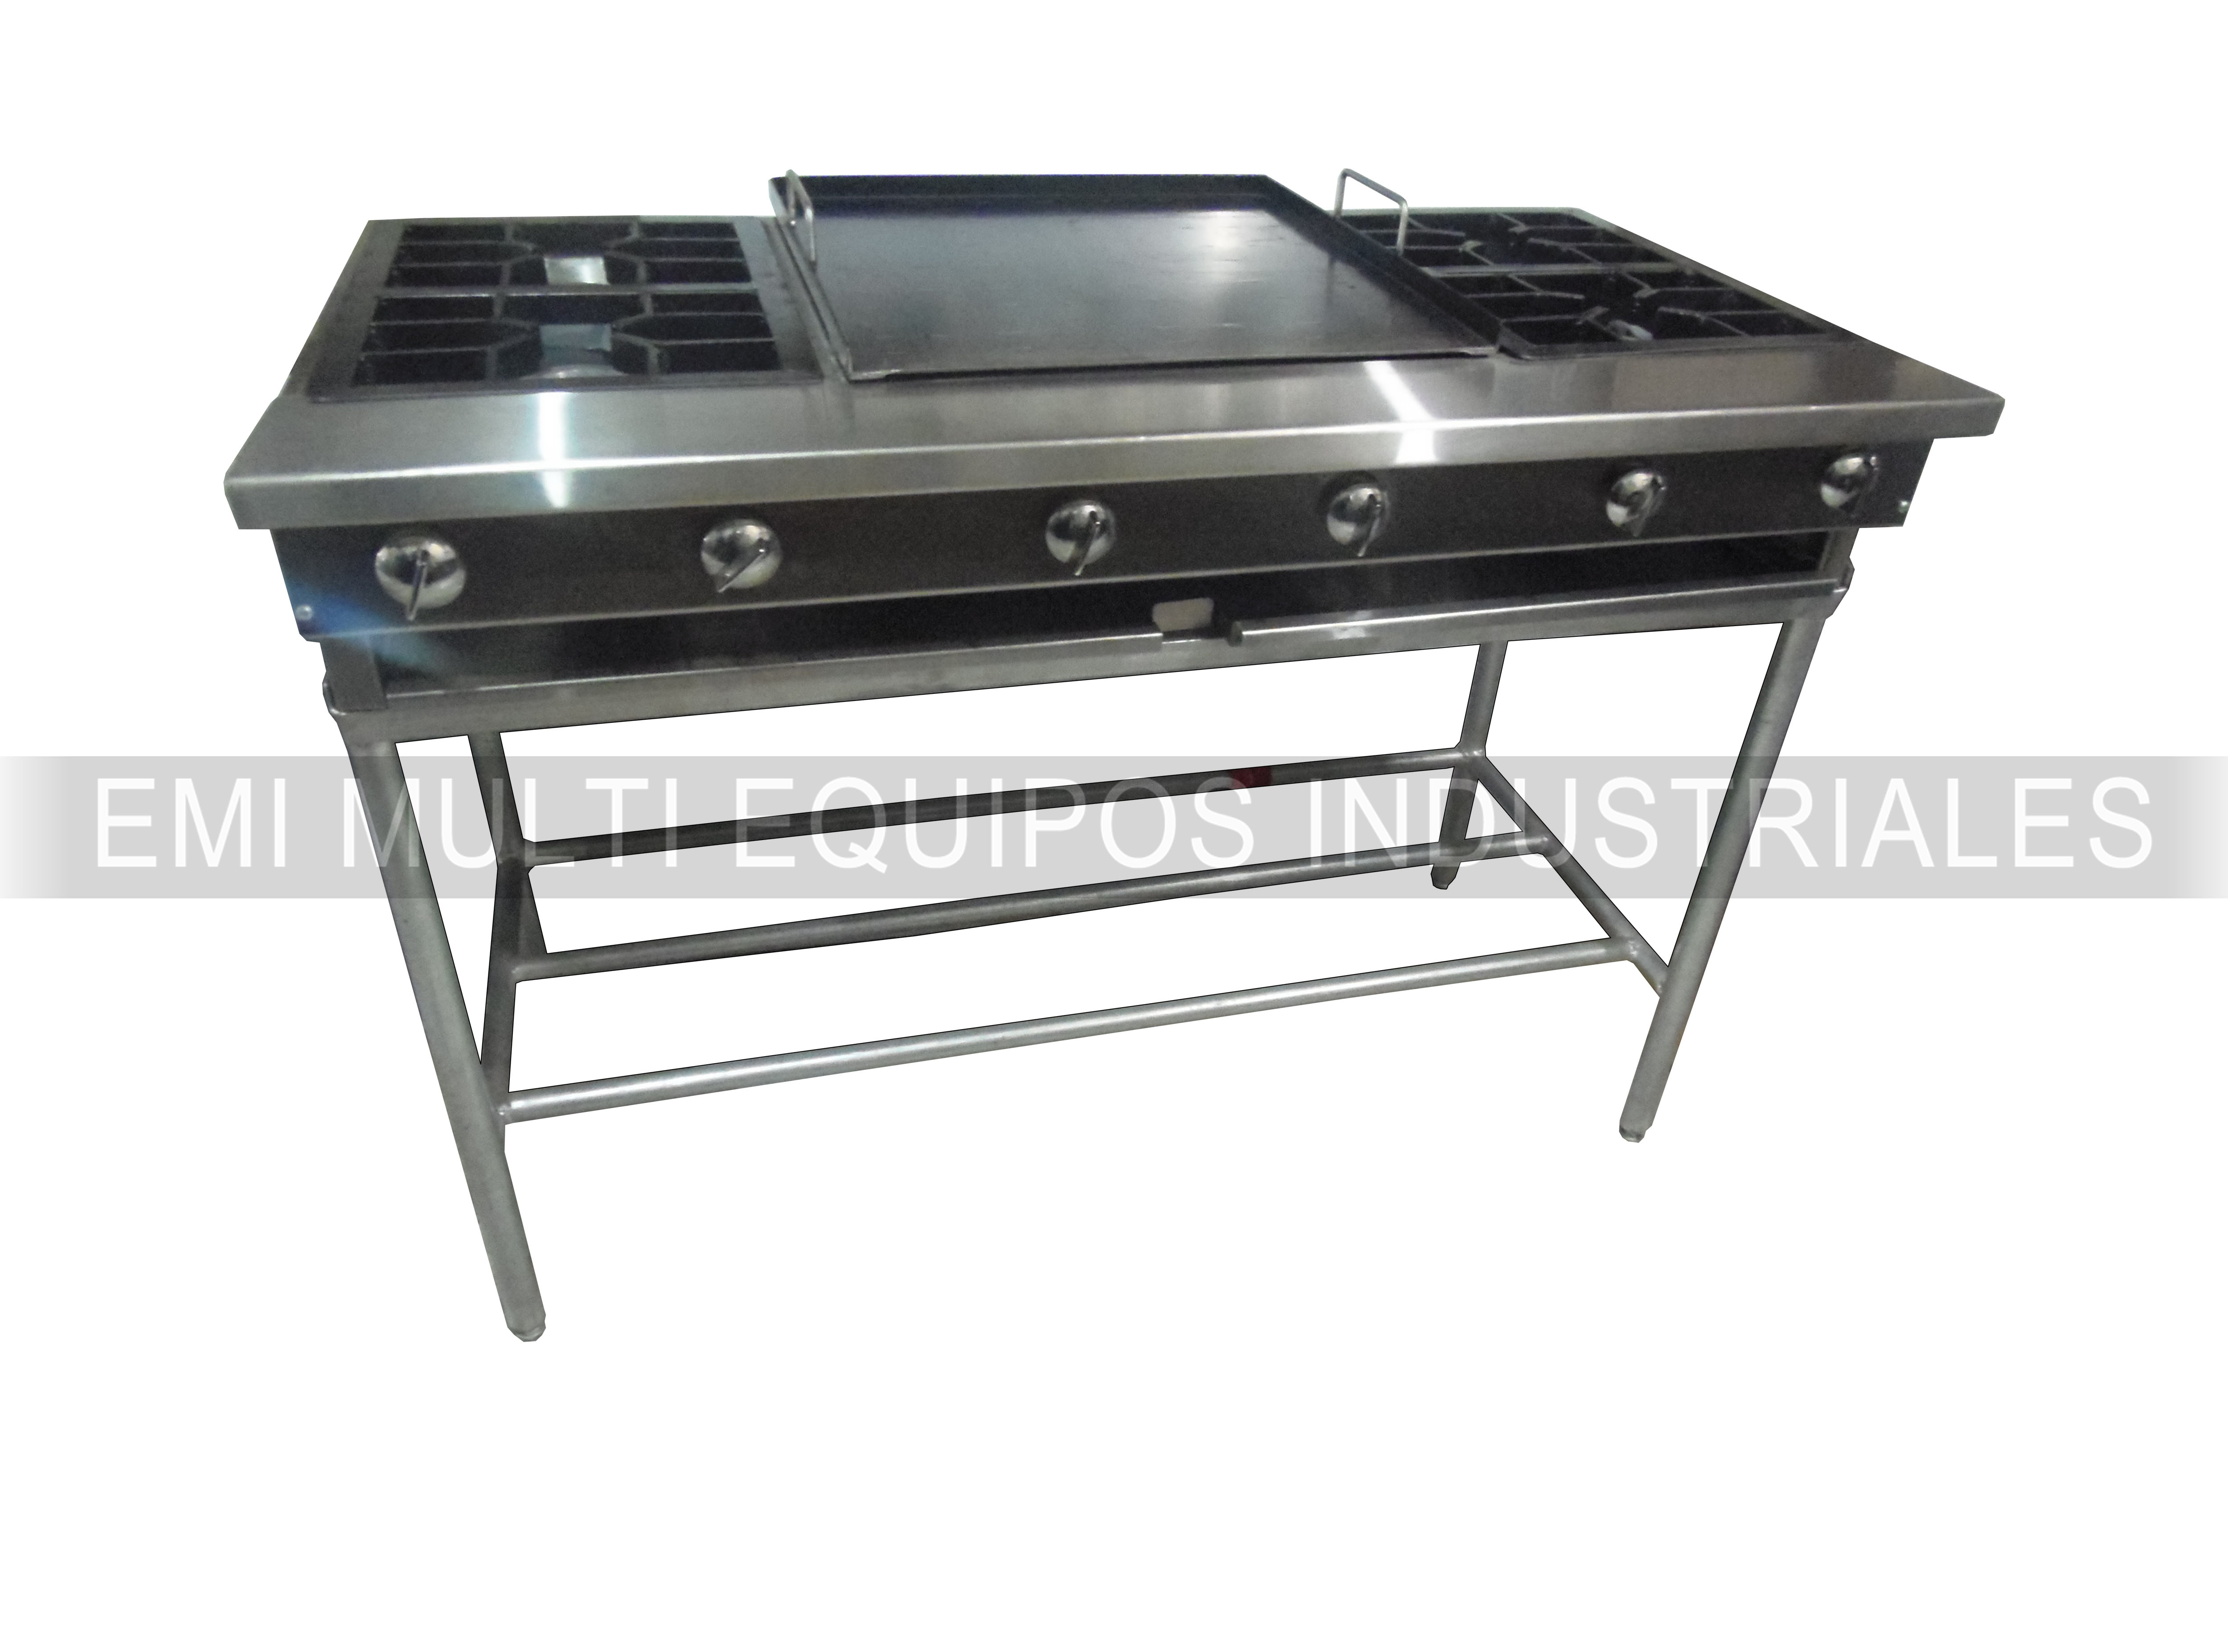 Cocinas con plancha incorporada cocina con cuarto de - Cocinas con plancha incorporada ...